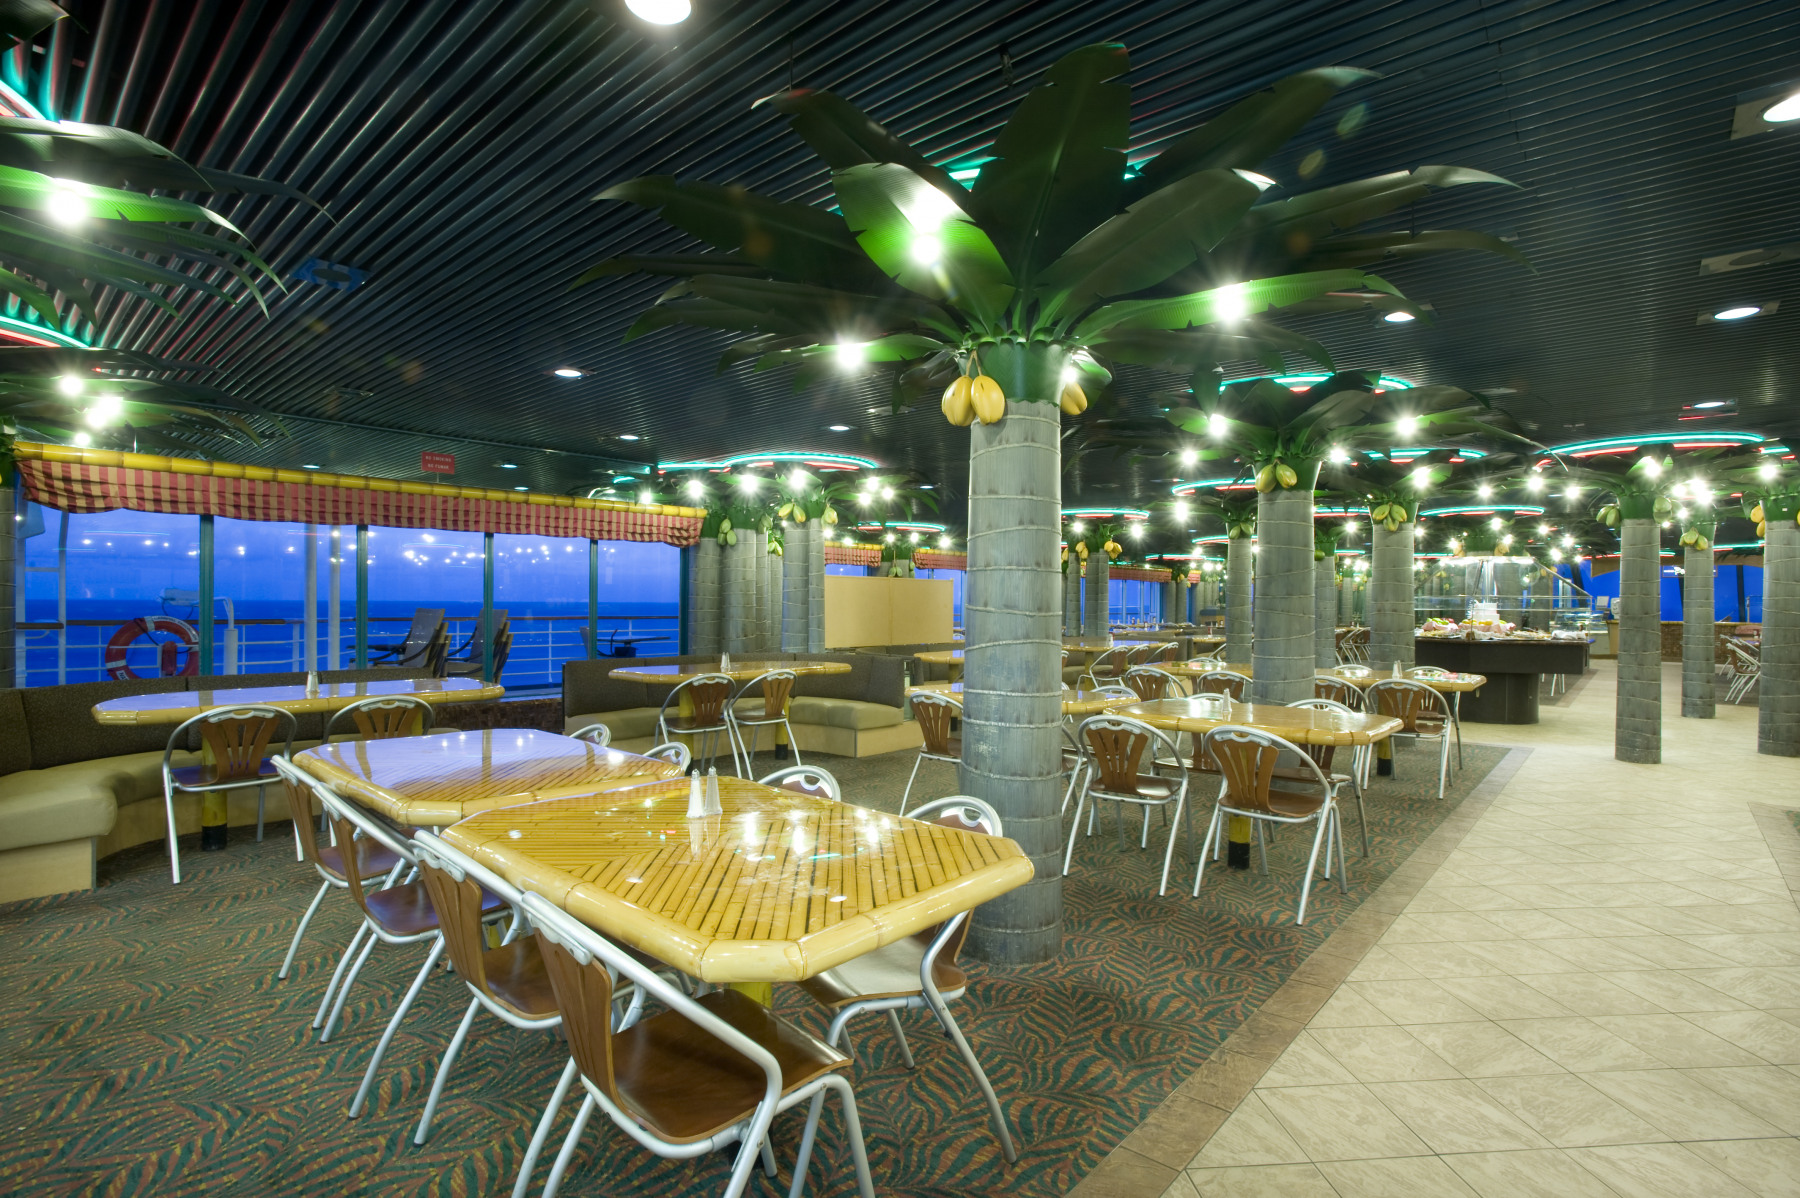 Carnival Fascination Coconut Grove Restaurant 1.jpg